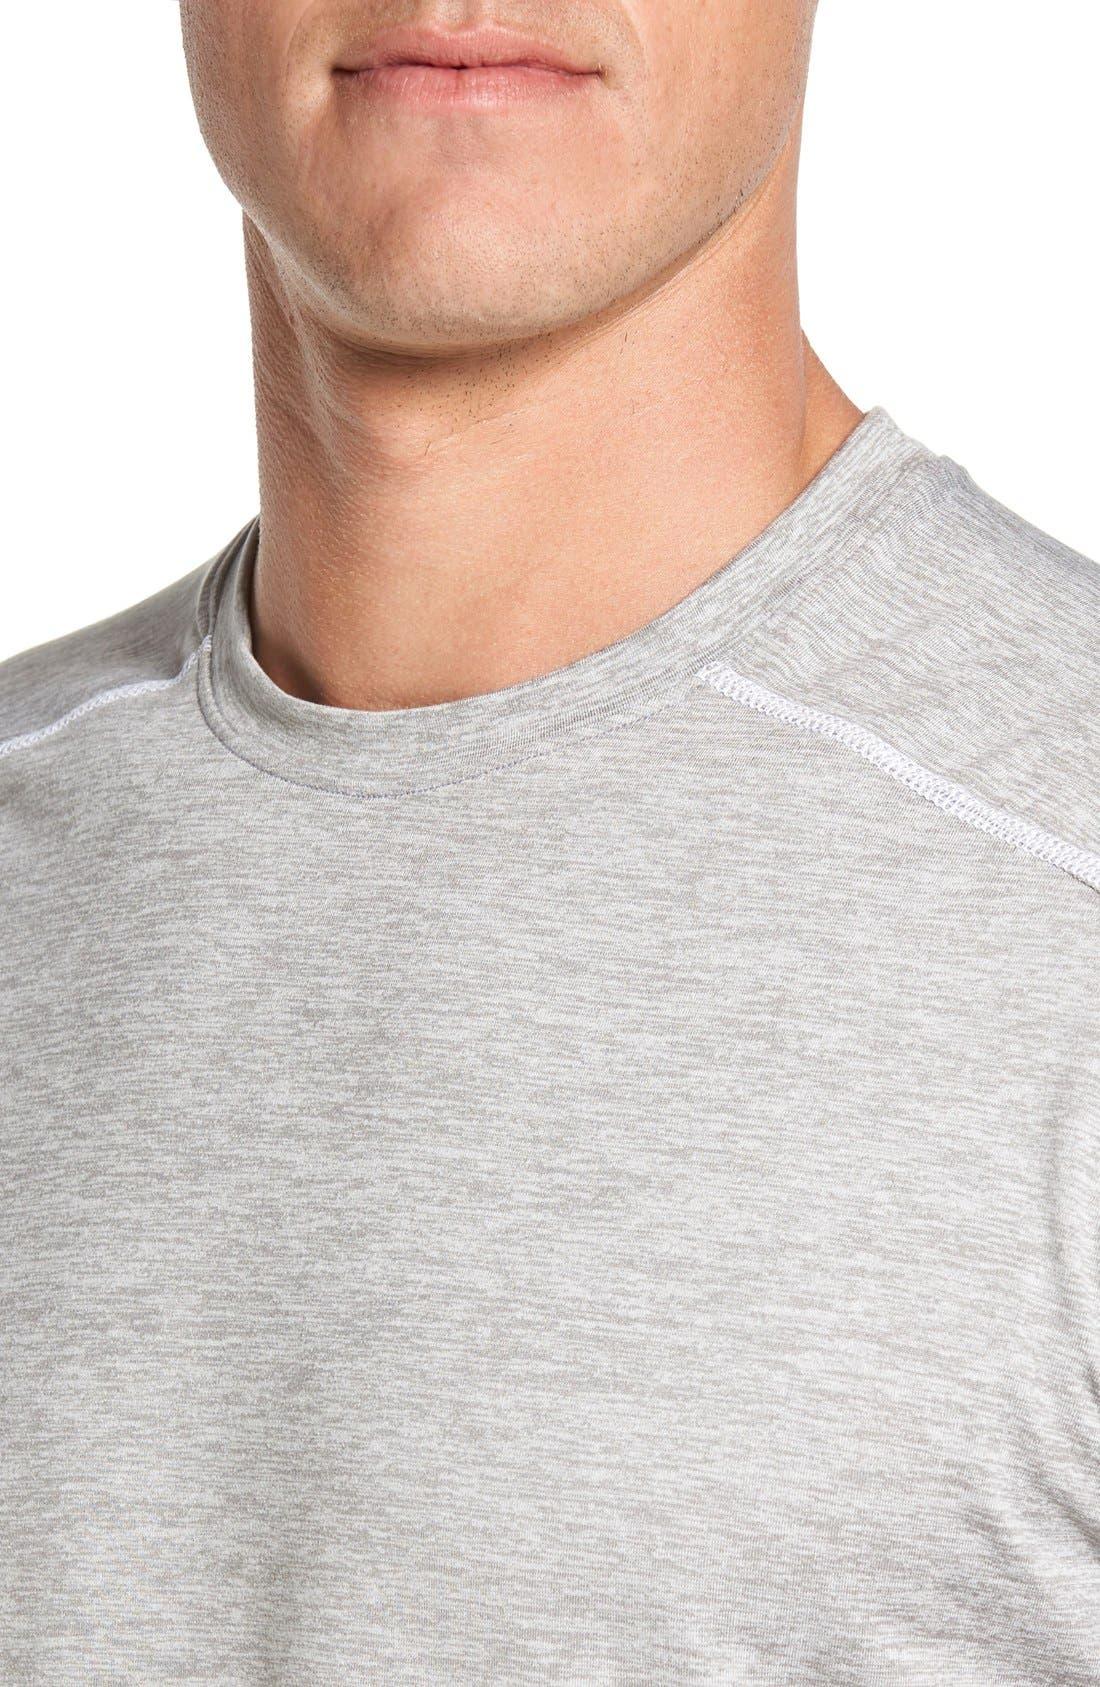 'Cooldown' Moisture Wicking Training T-Shirt,                             Alternate thumbnail 4, color,                             030